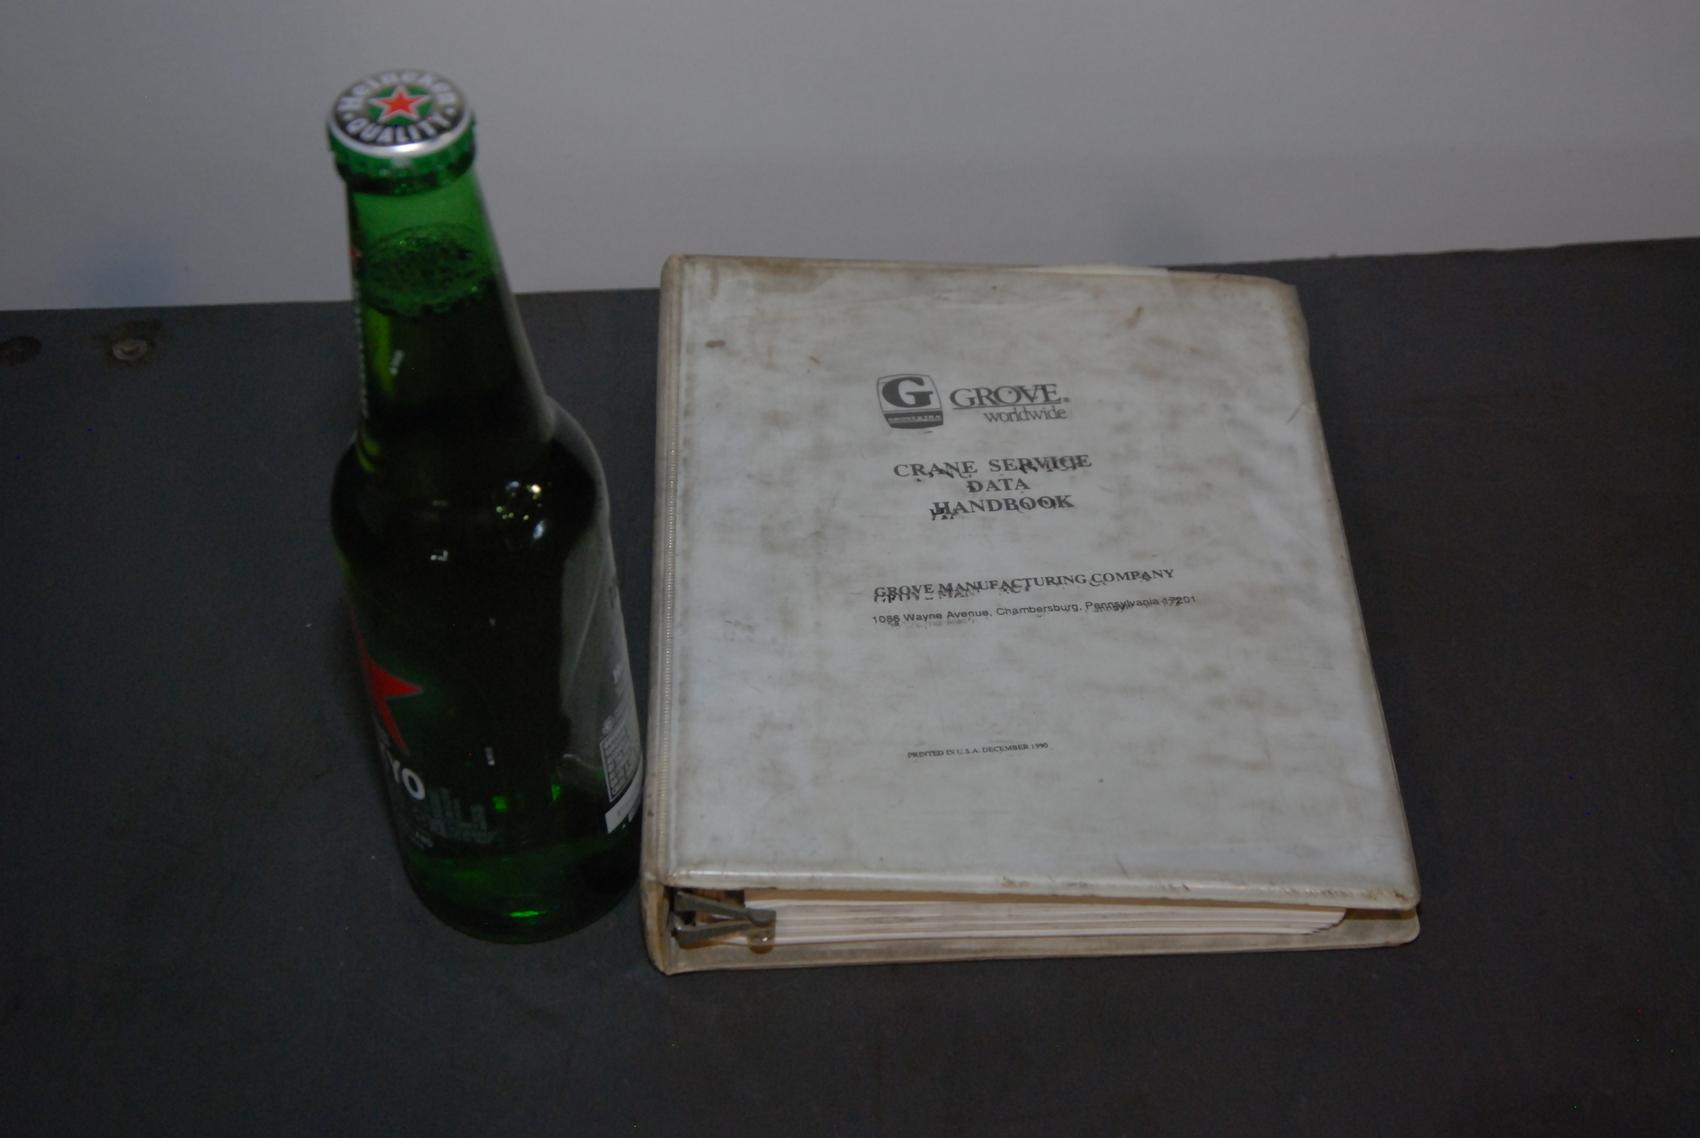 GROVE RT seria Crane operators handbook manual nopl